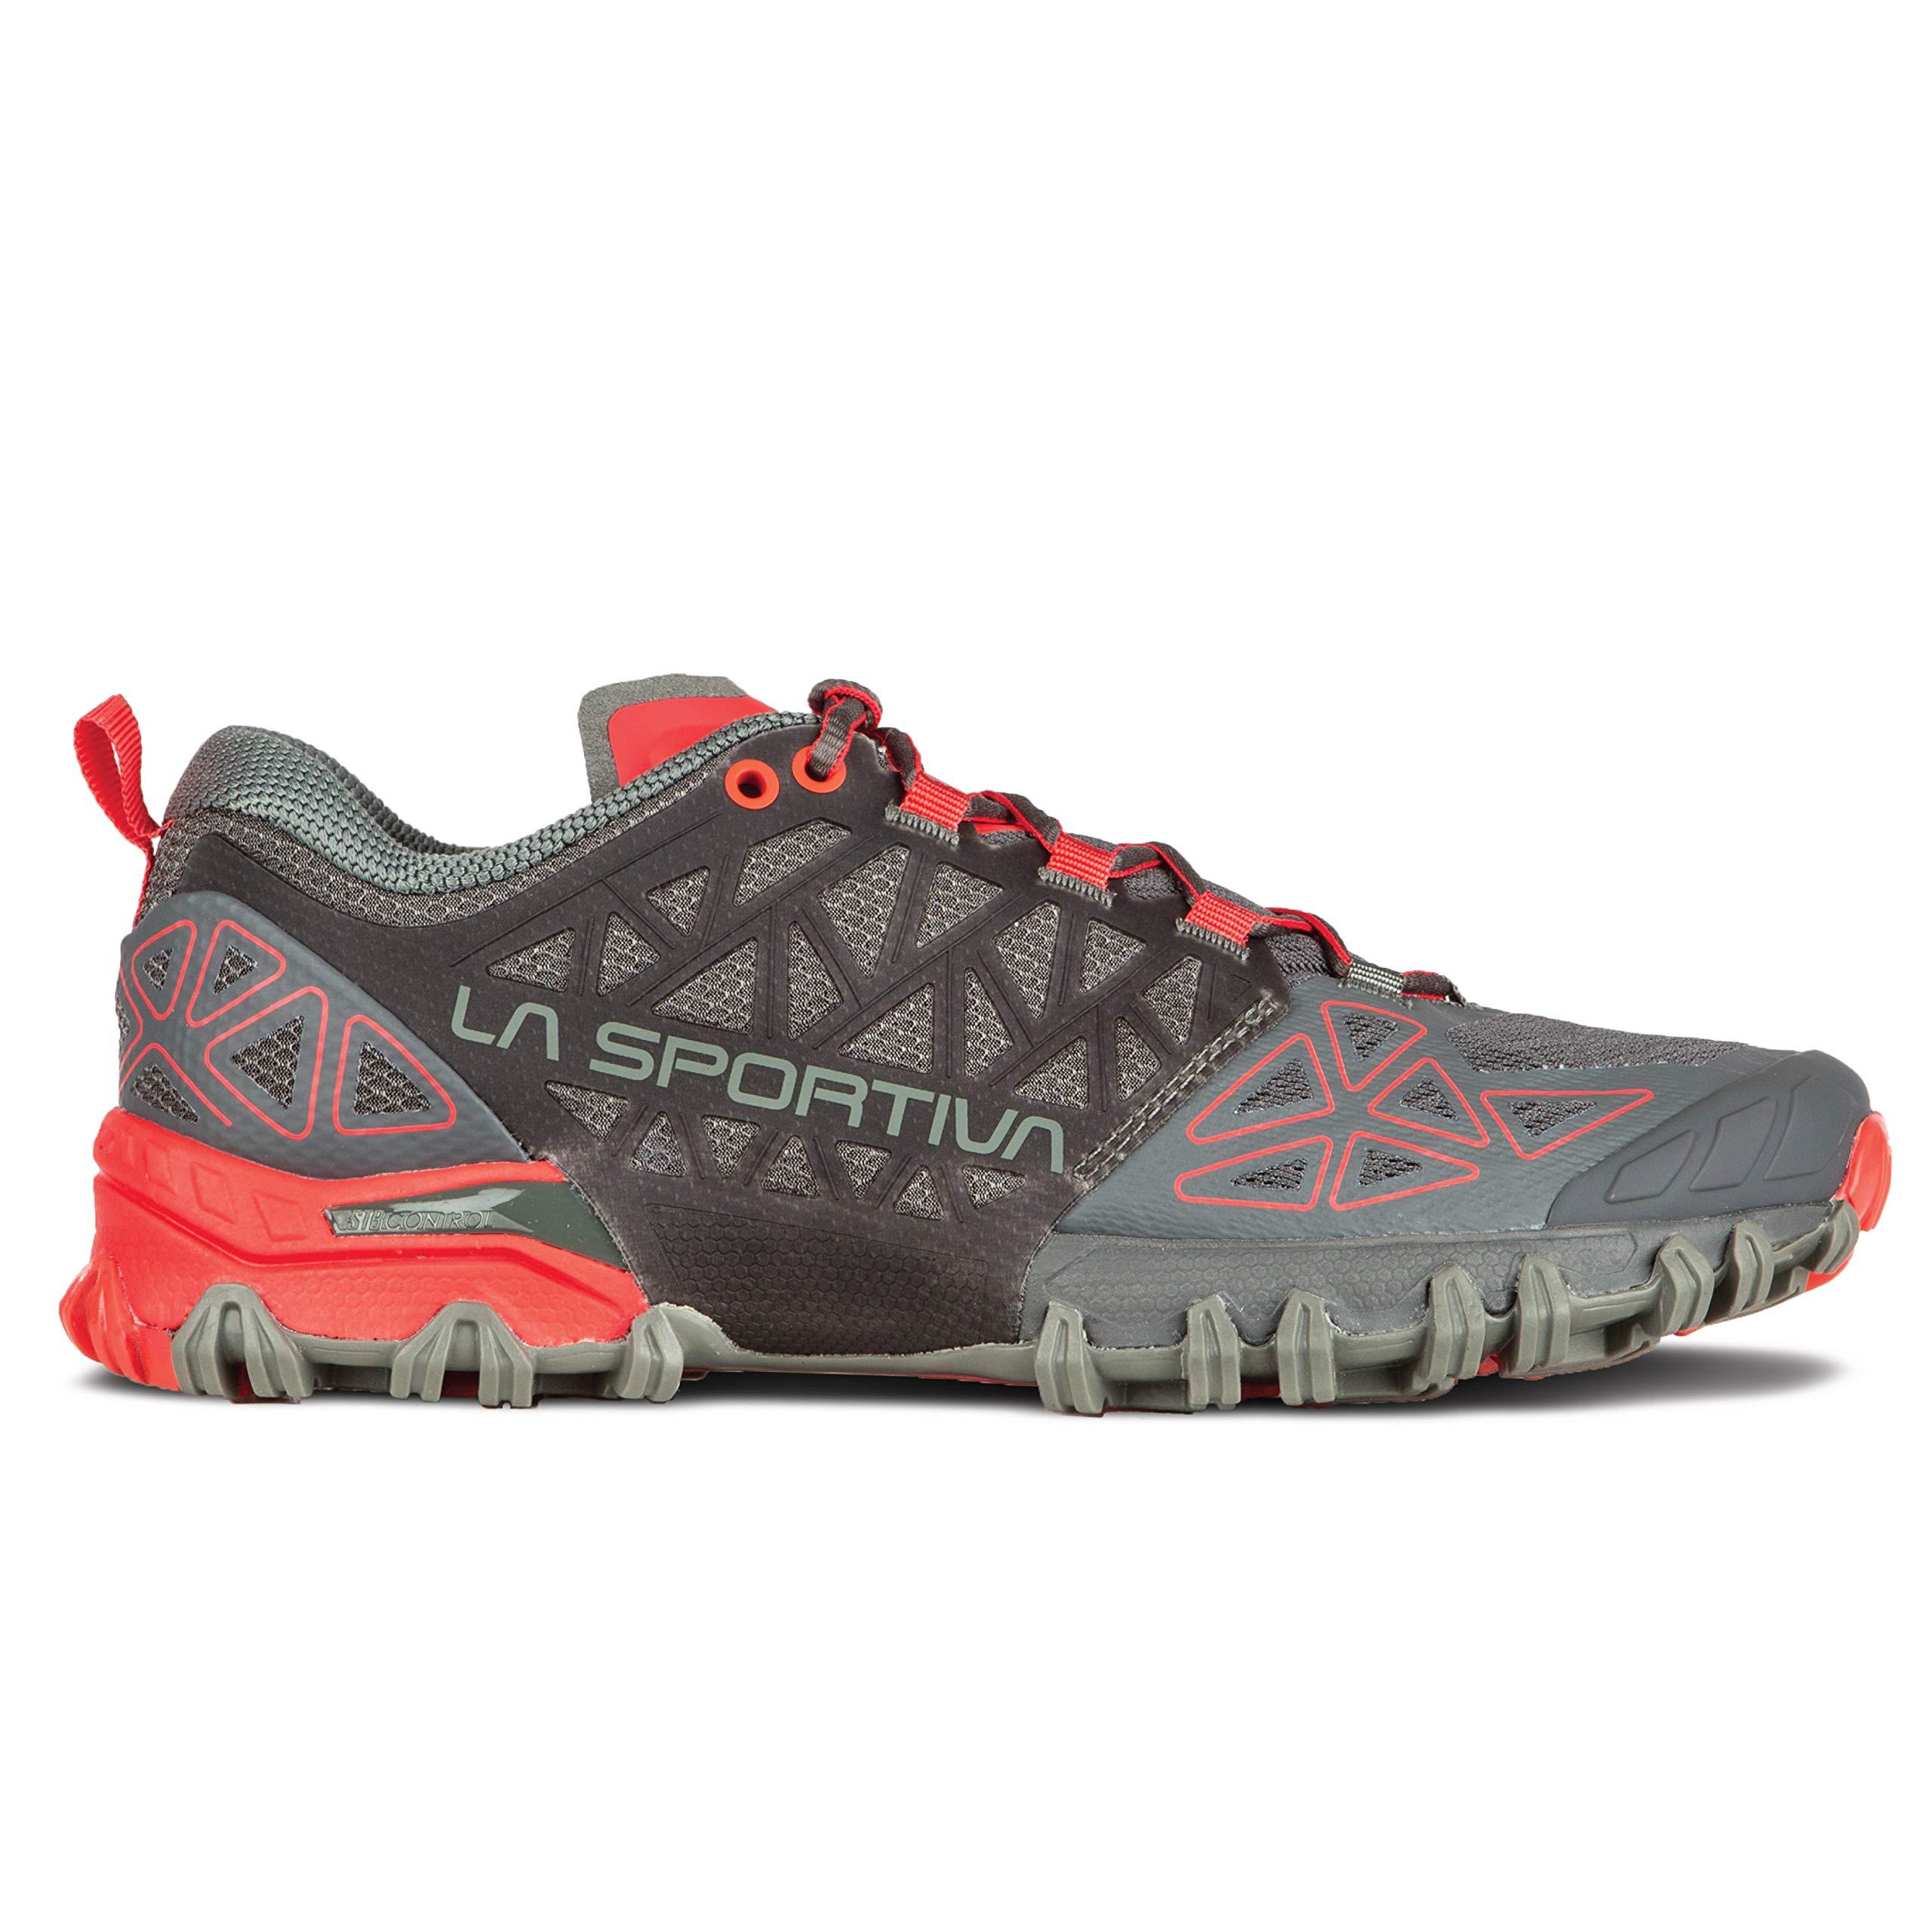 La Sportiva Women's Bushido II Running Shoe